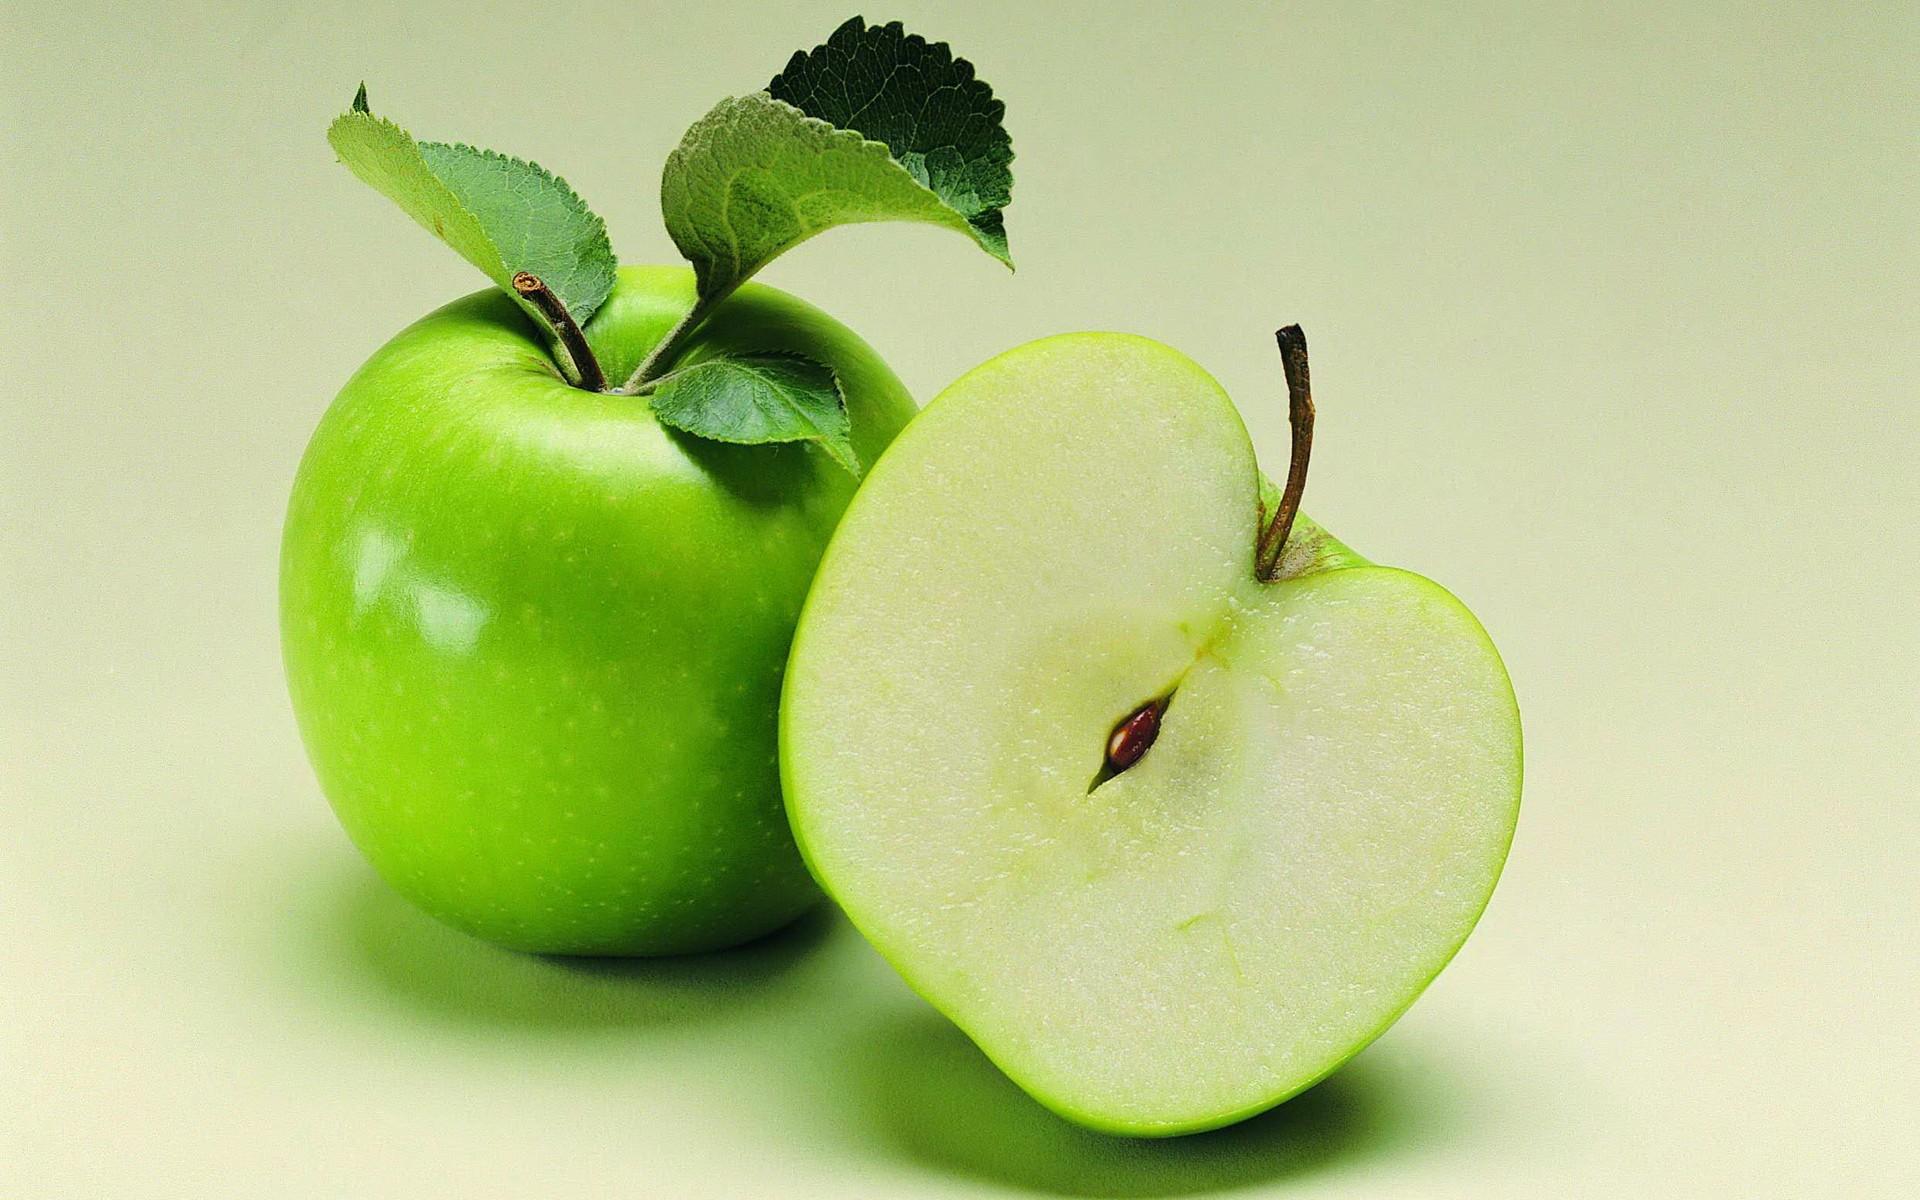 Free Green Apple Wallpaper